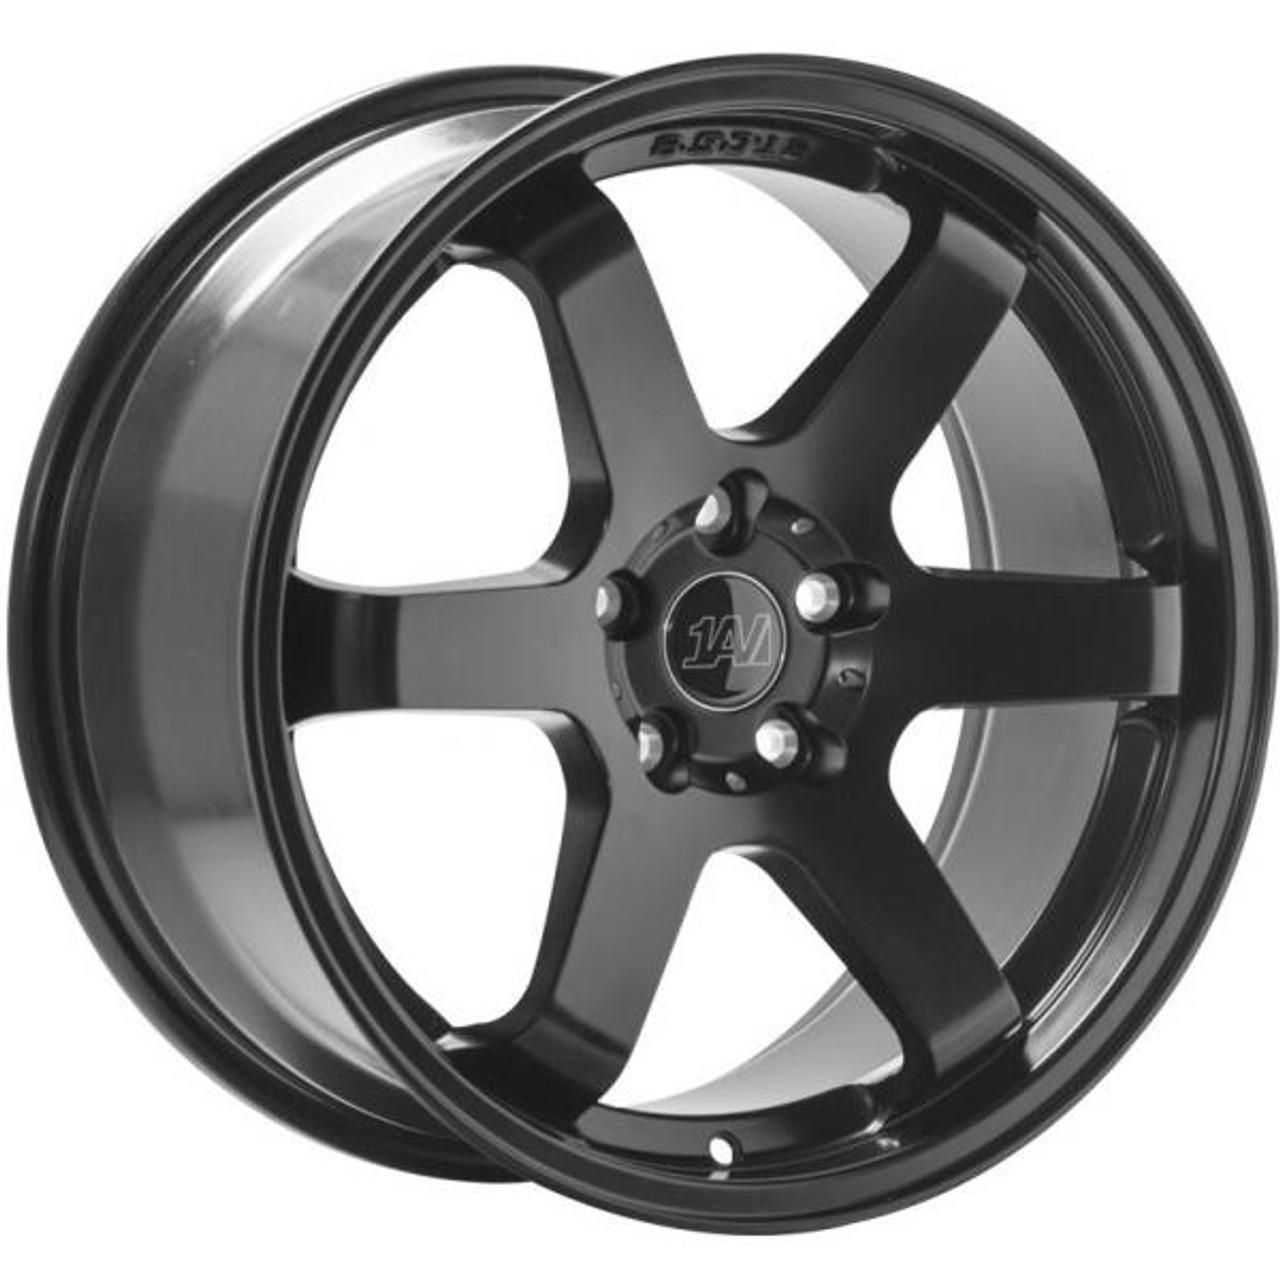 1AV ZX6 Alloy Wheels SATIN BLACK